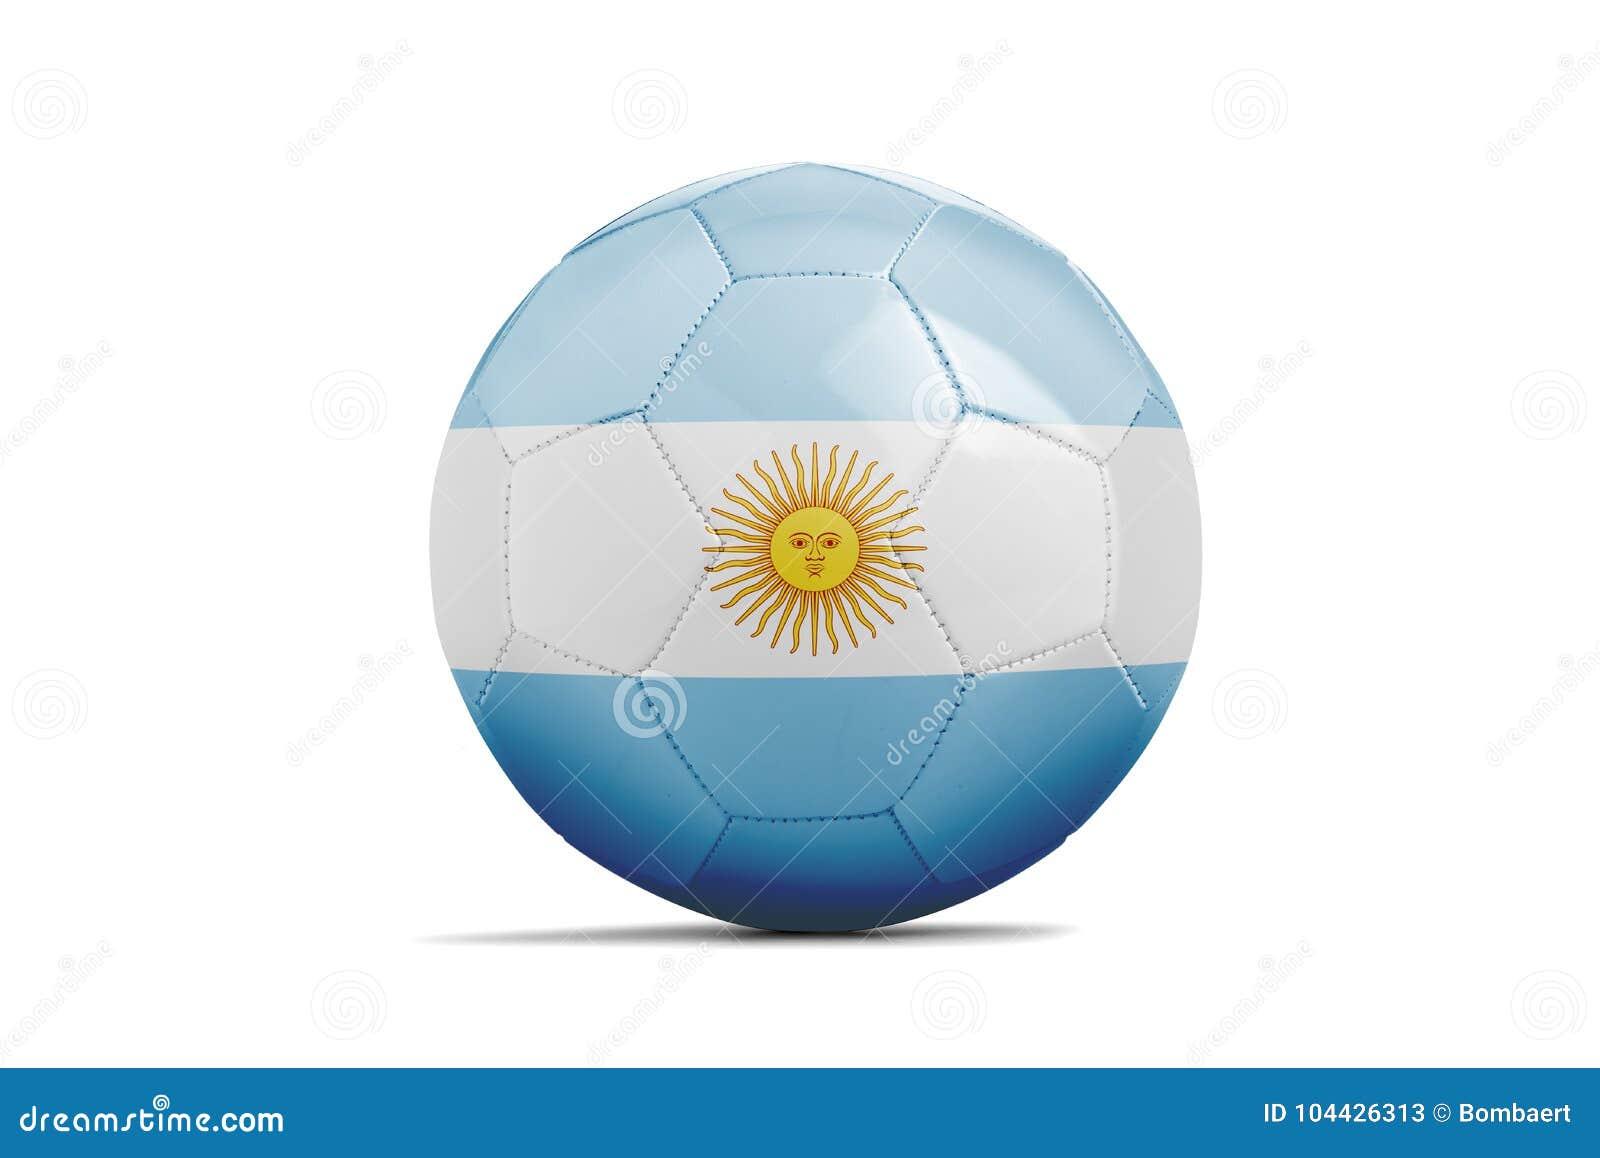 Fotbollboll med lagflaggan, Ryssland 2018 arenaceous